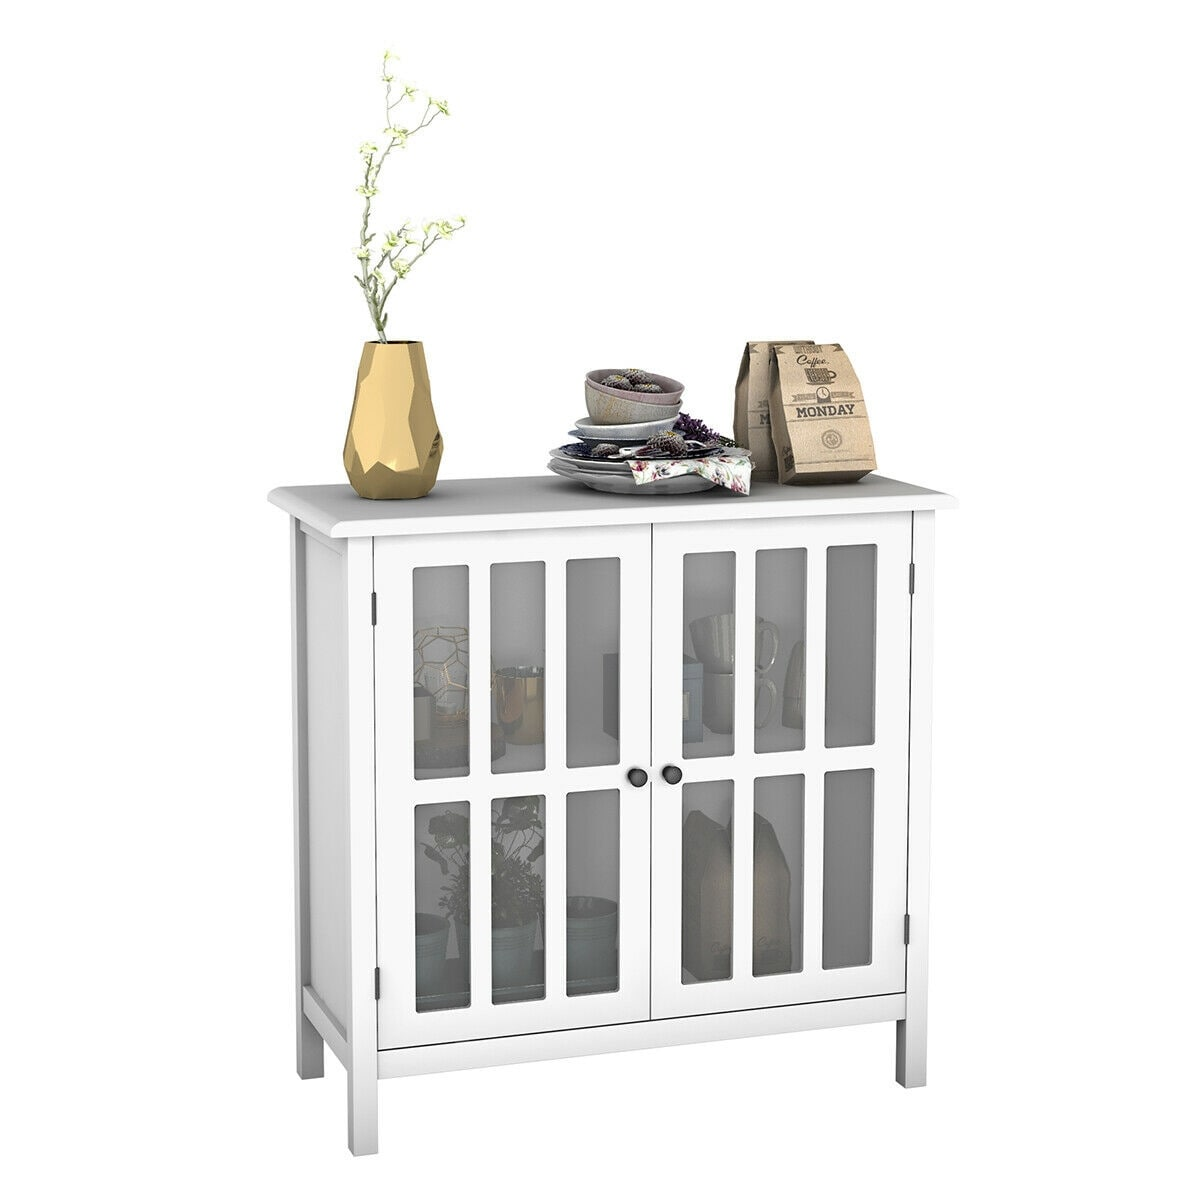 Dining Room Buffet Side Board Table Storage Cabinet Elegant Sliding Door Pantry